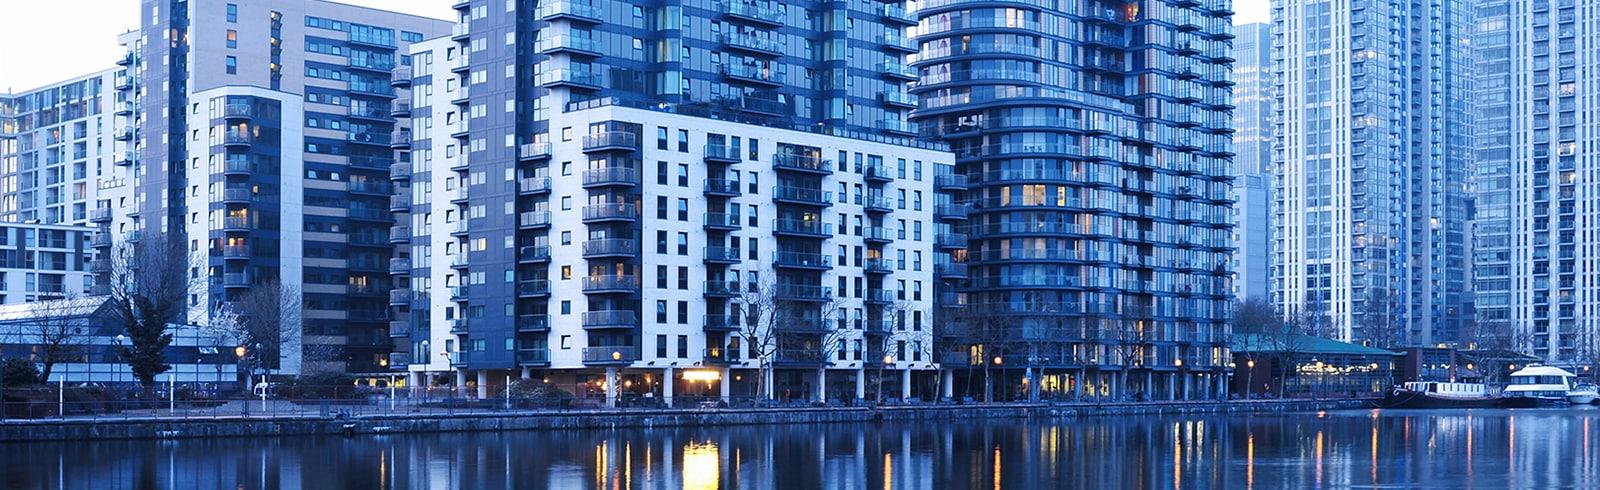 london canary wharf apartments